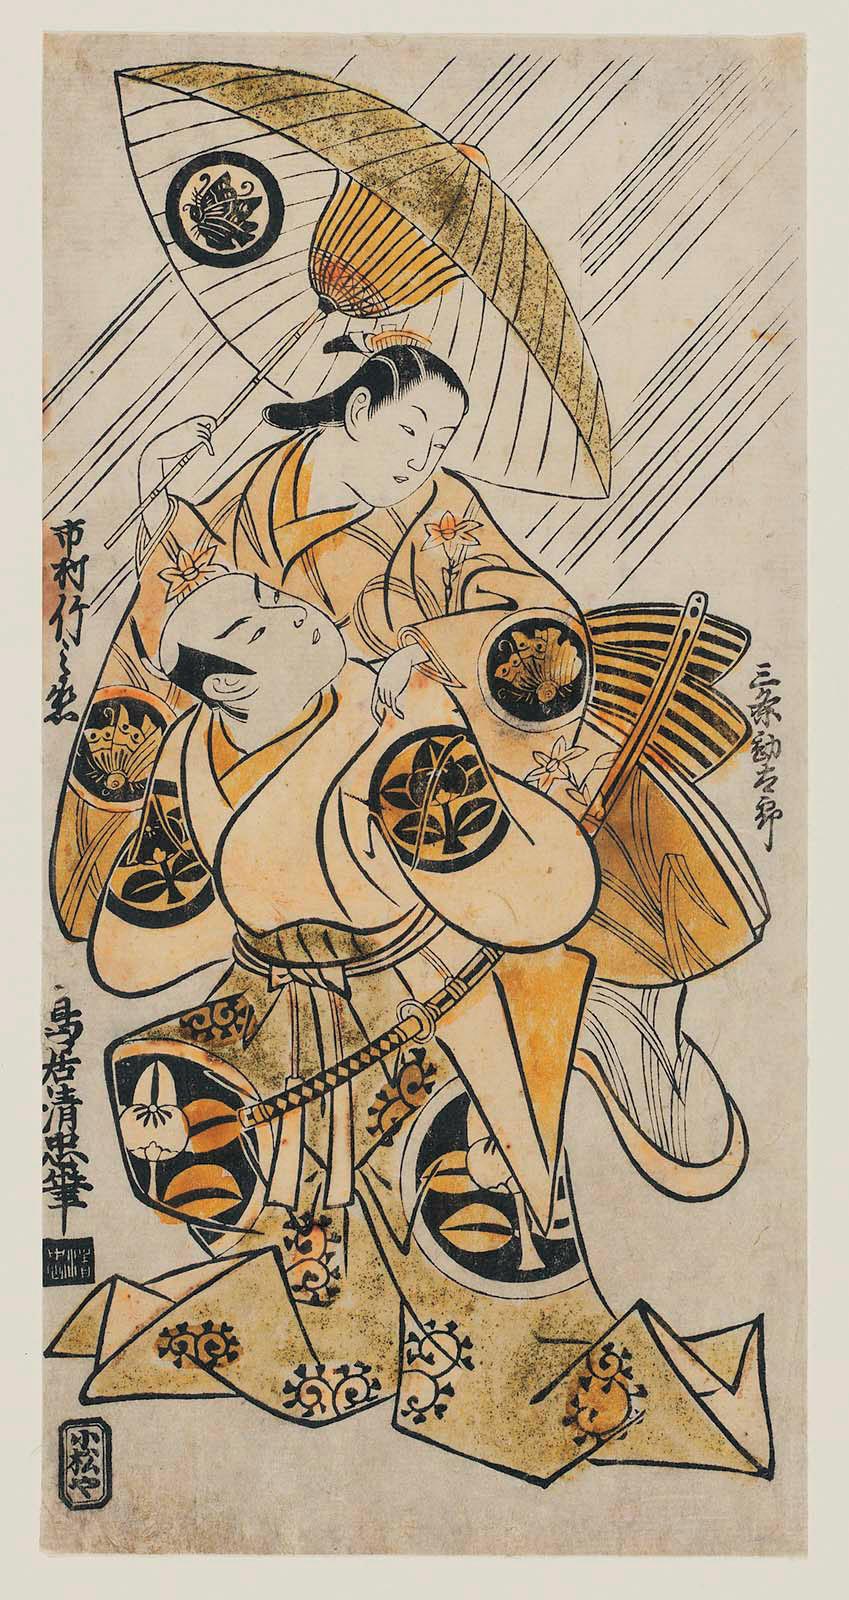 A beni-e Japanese woodblock print.